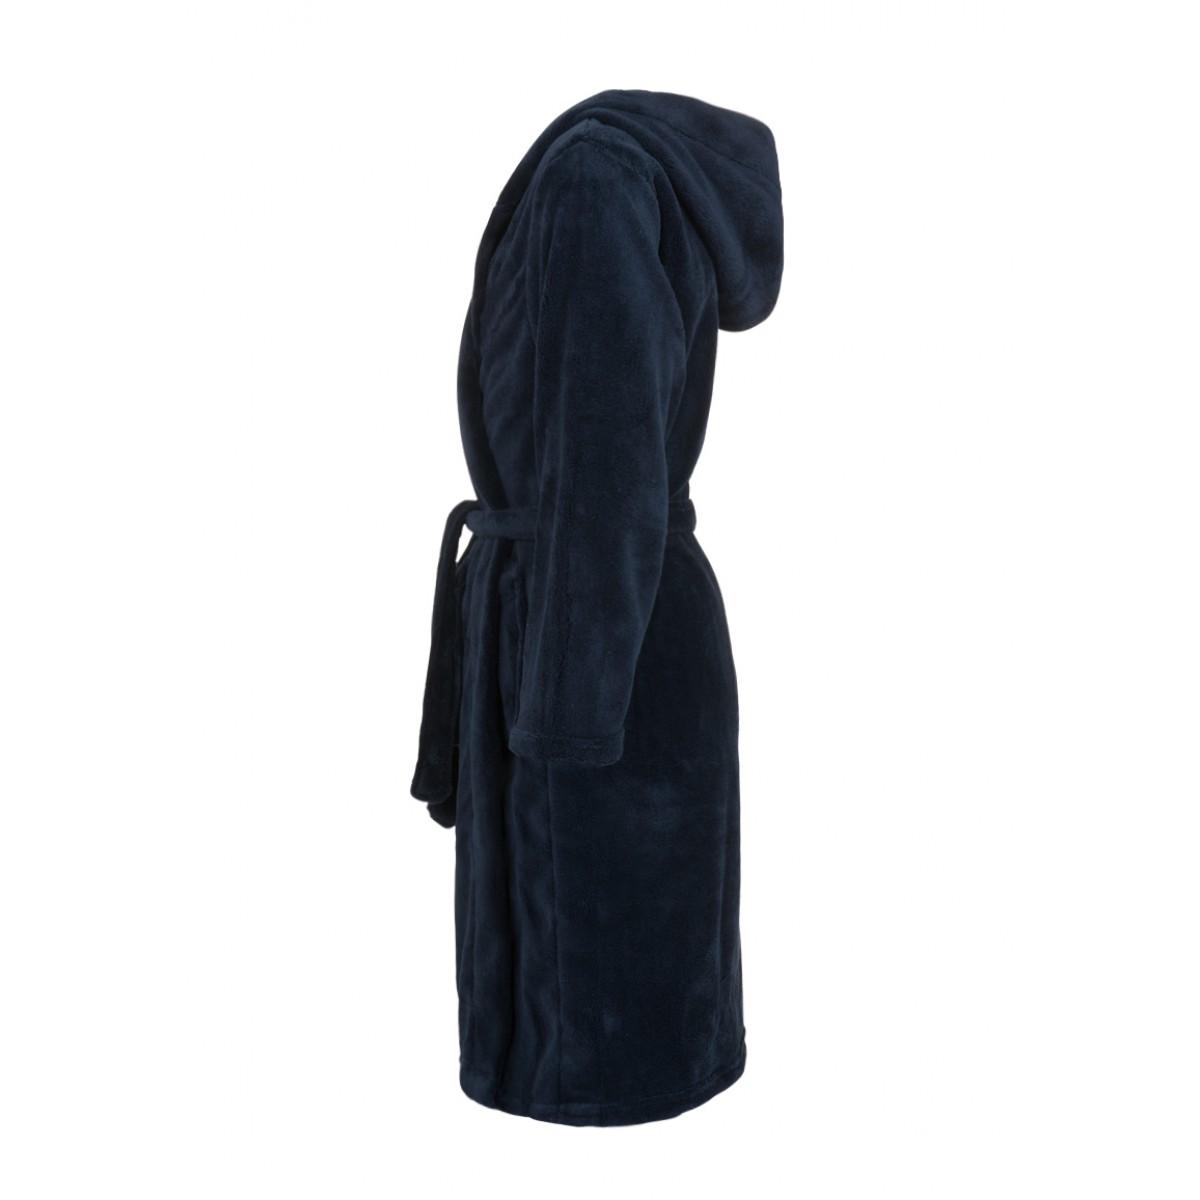 Stoere jongensbadjas met kap